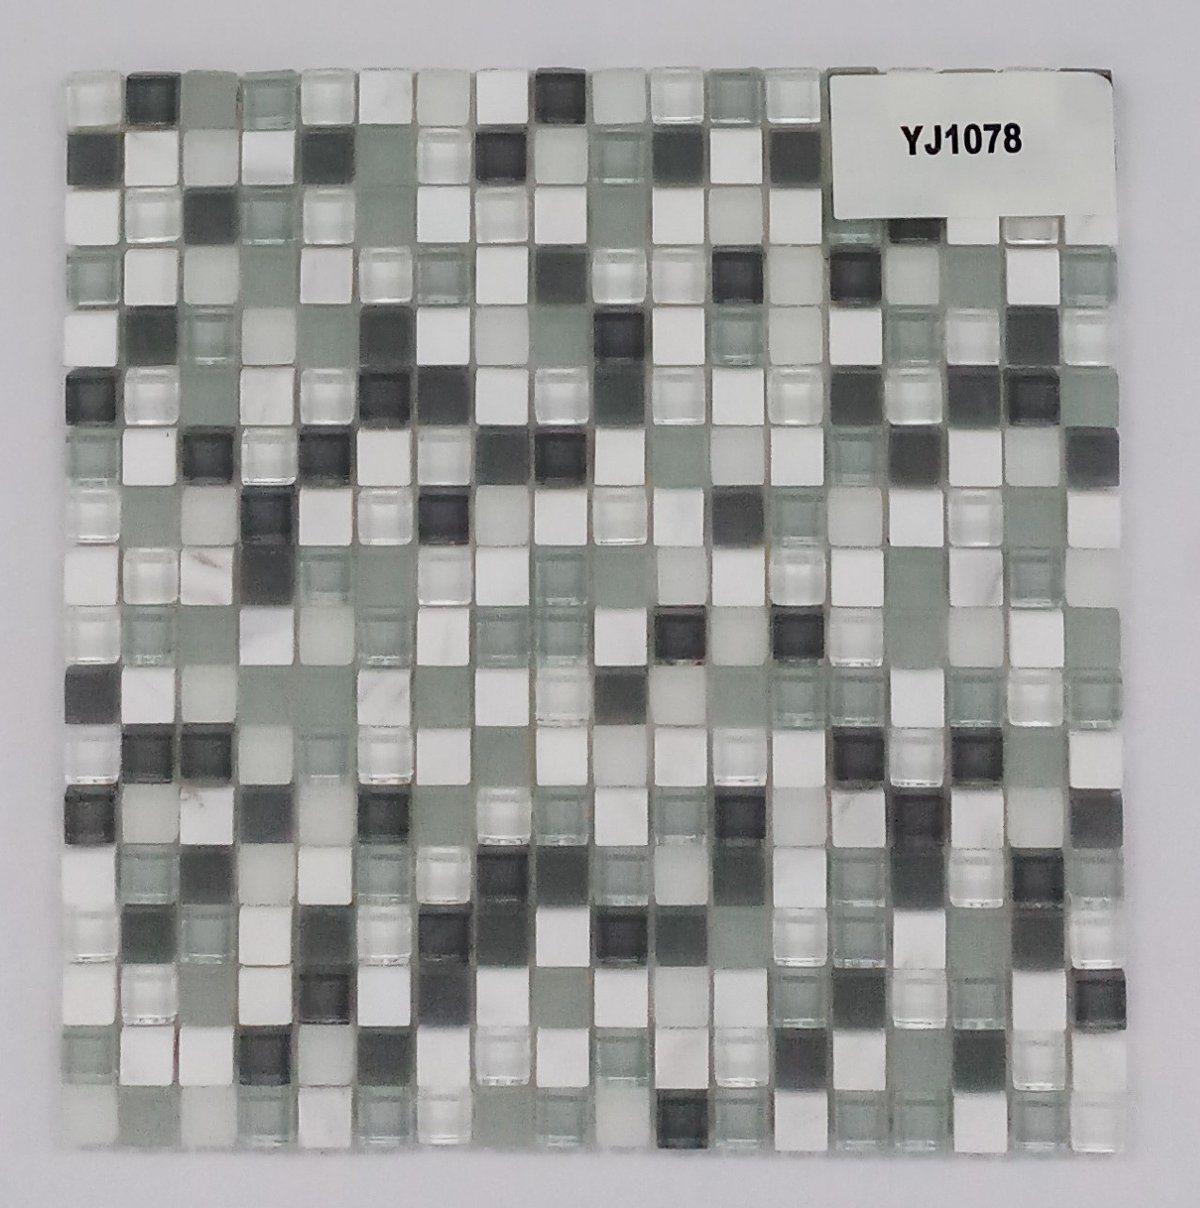 China Classical Style Hot Sale Glass And Stone Mosaic For Kitchen Backsplash Tiles China Glass Mosaic Stone Mosaic